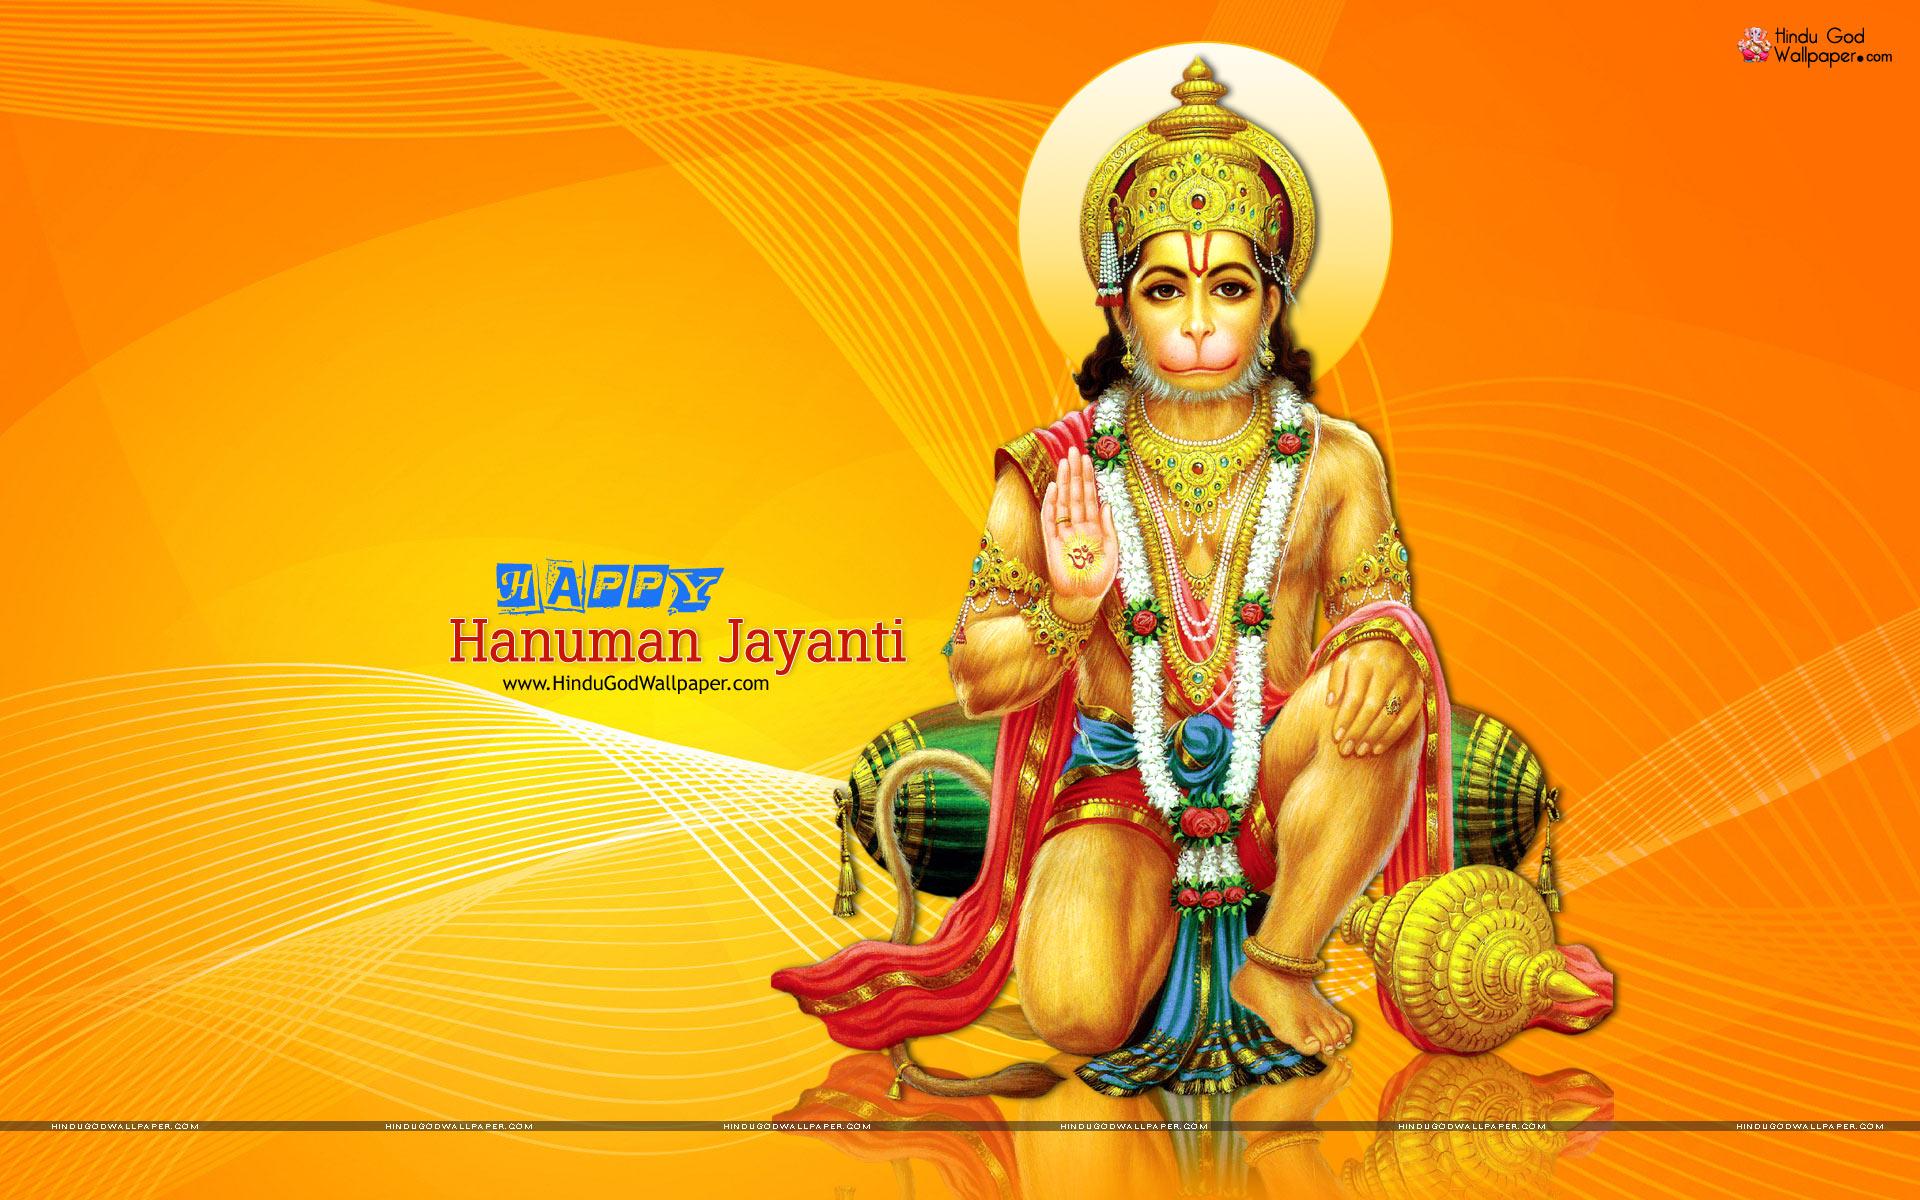 Hd wallpaper hanuman - Hd Wallpaper Hanuman 27